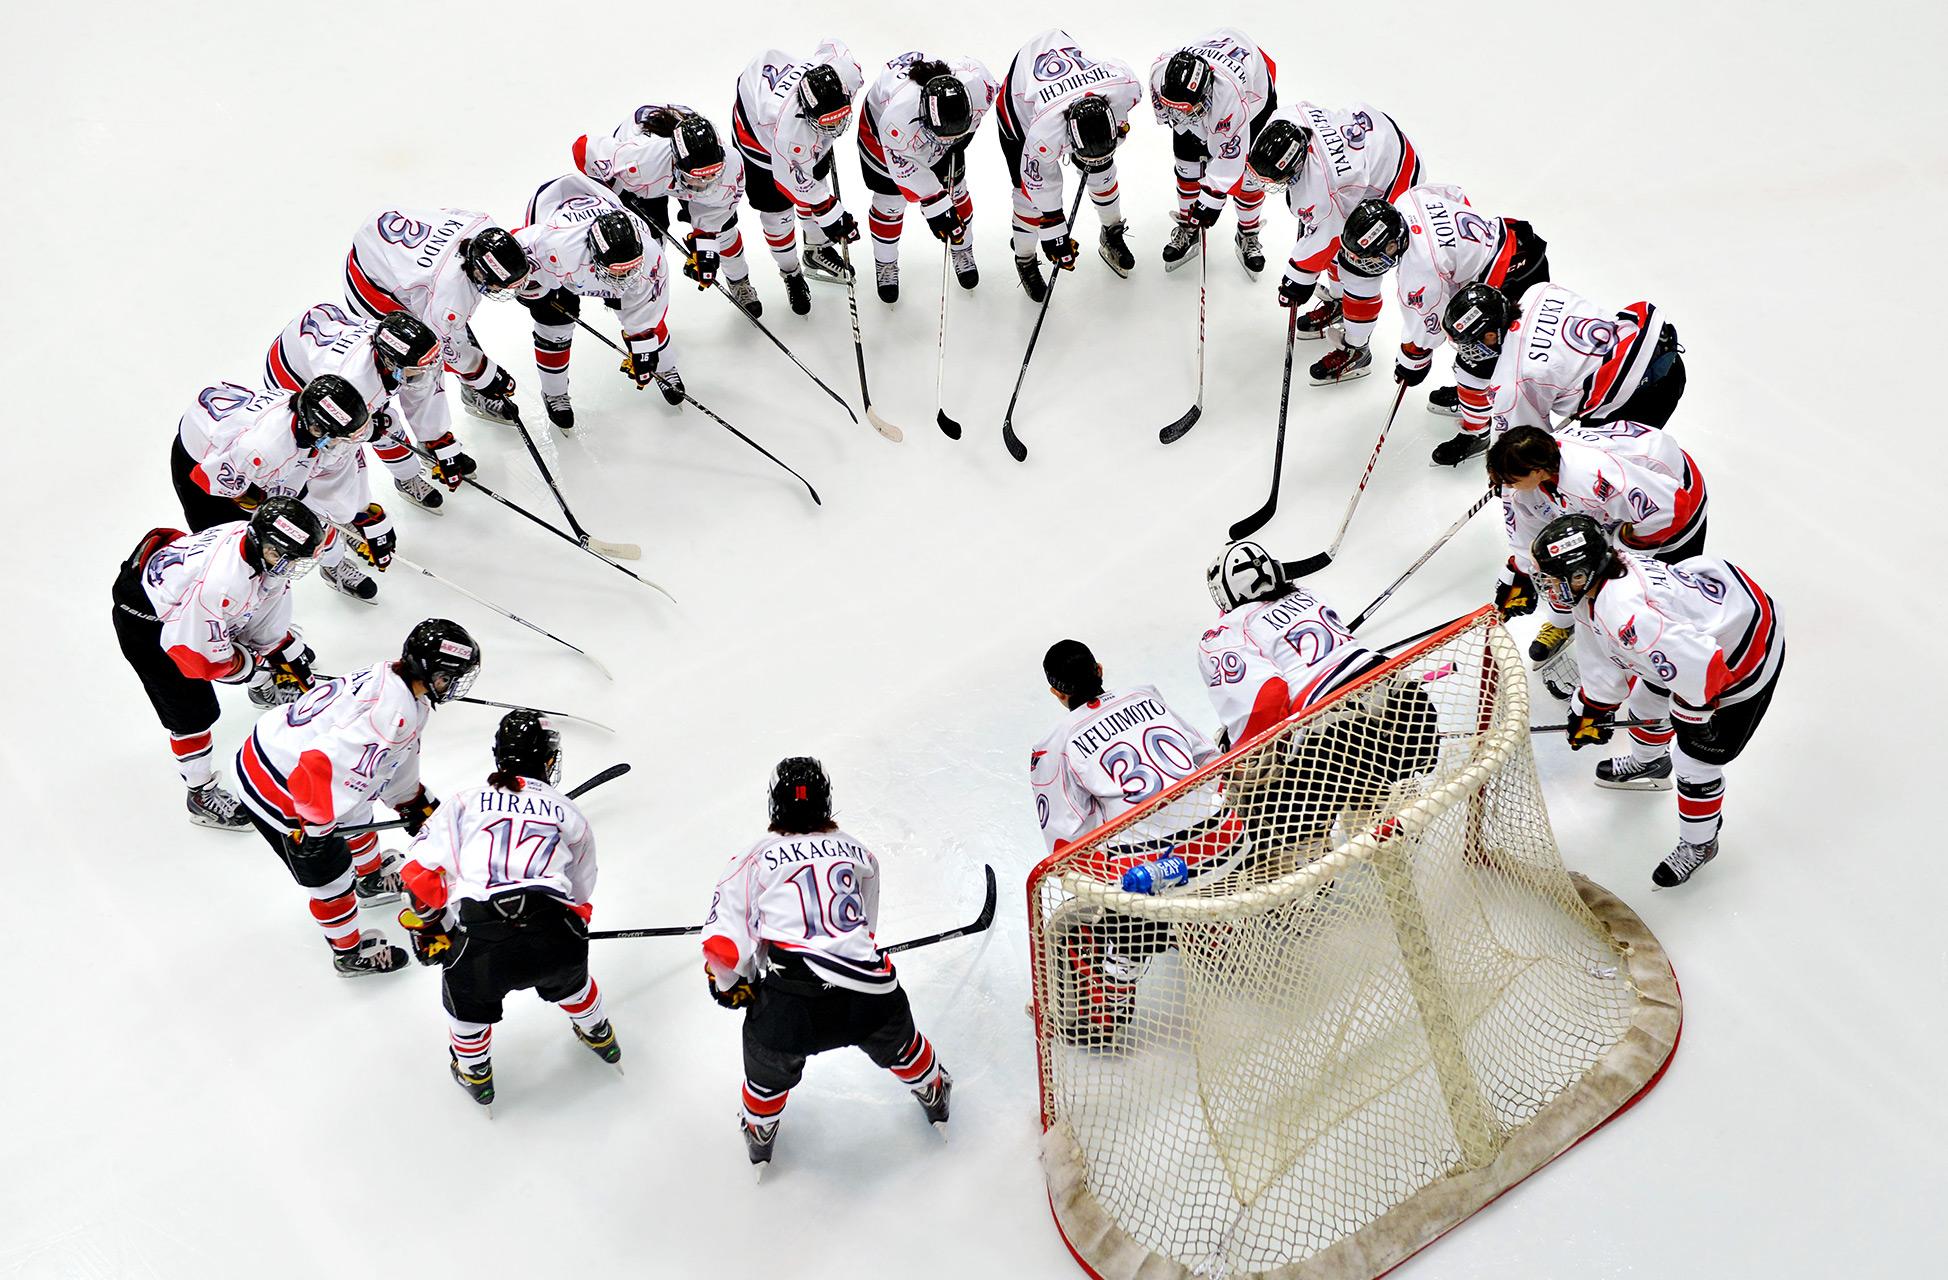 Japan vs. Slovakia